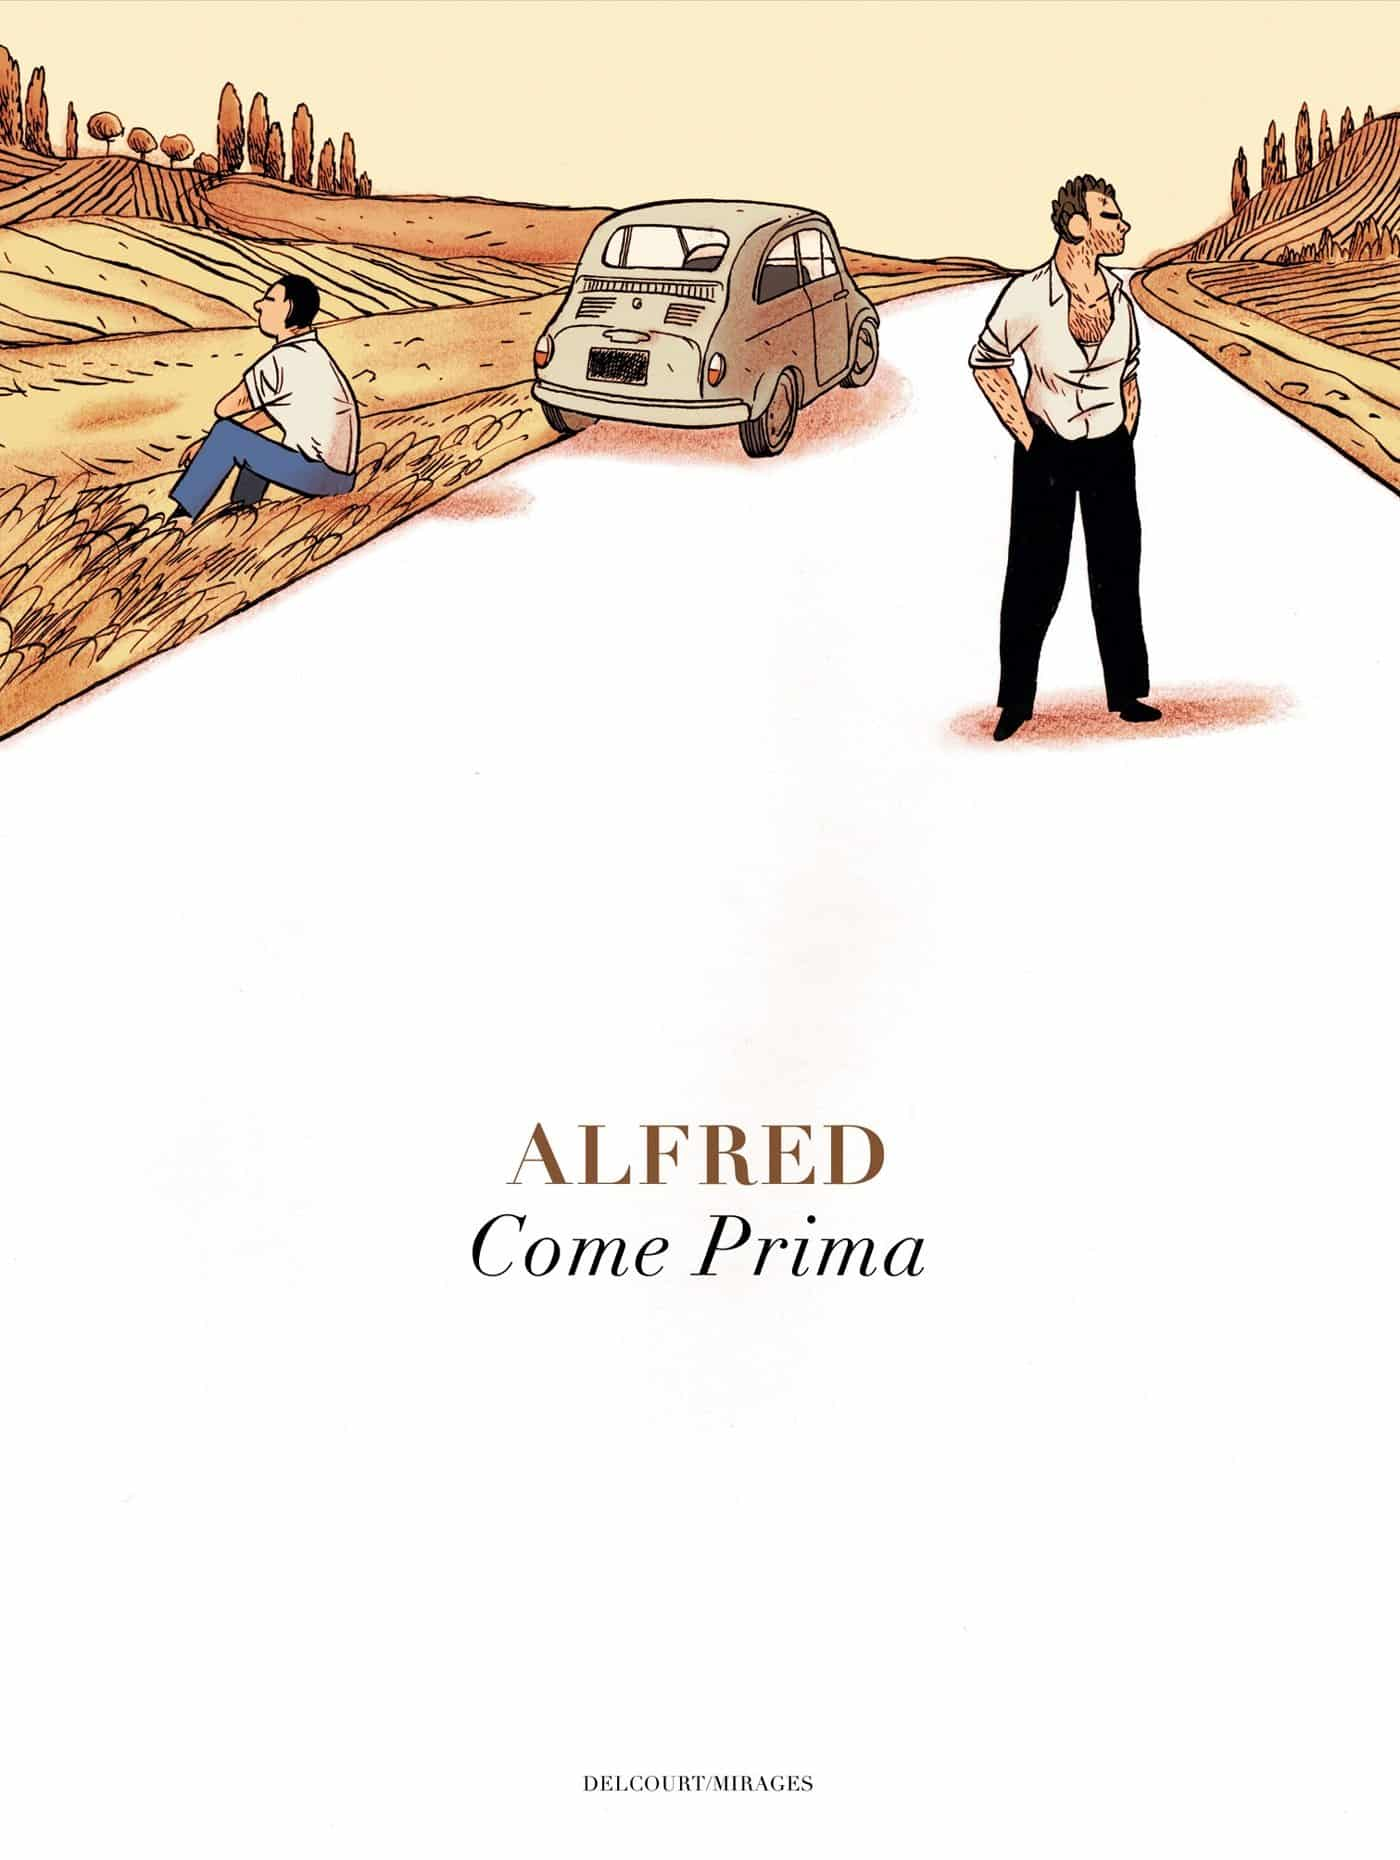 Angoulême 2014 : prix du meilleur album à Come Prima d'Alfred